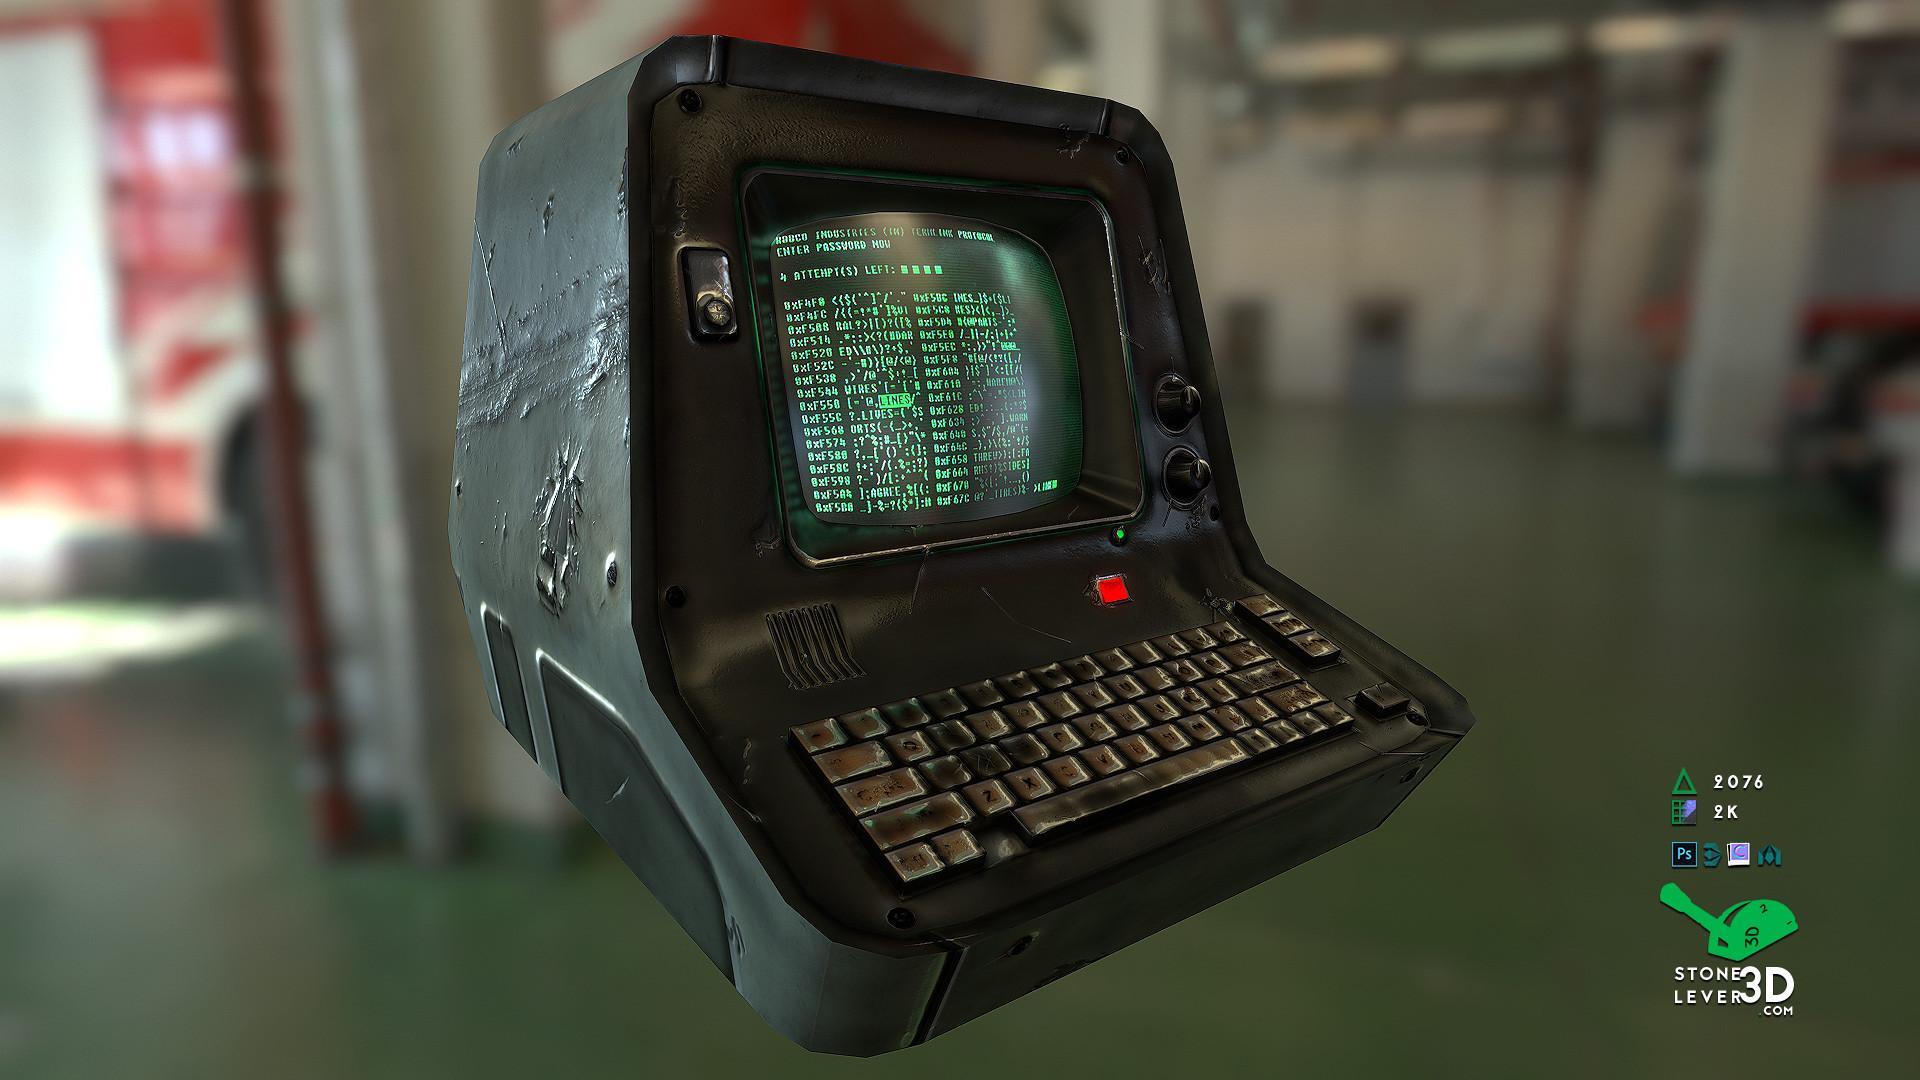 """PC Terminal"" Prop Model Replica"